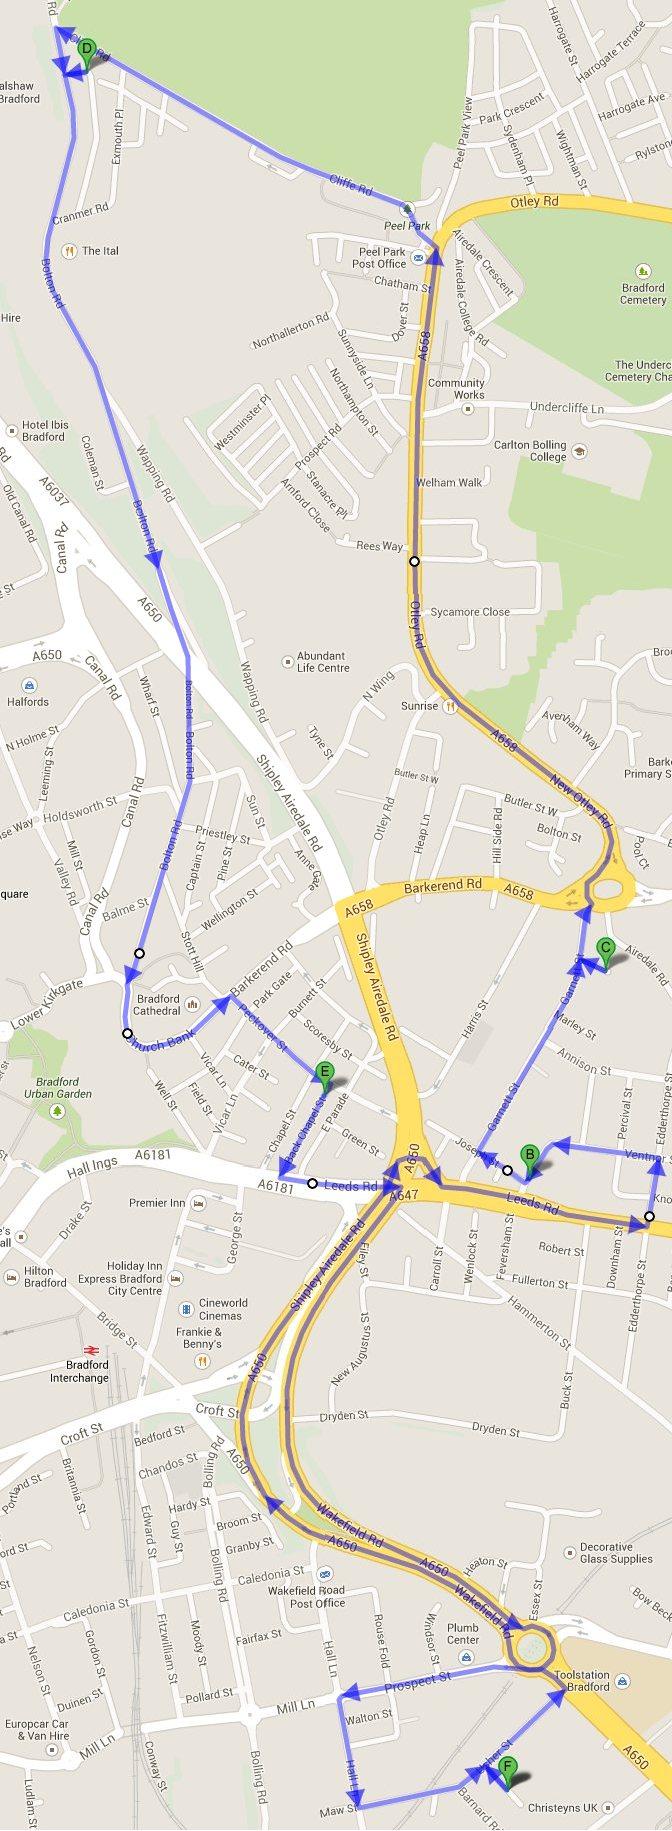 The Vaisakhi 2014 Nagar Kirtan route